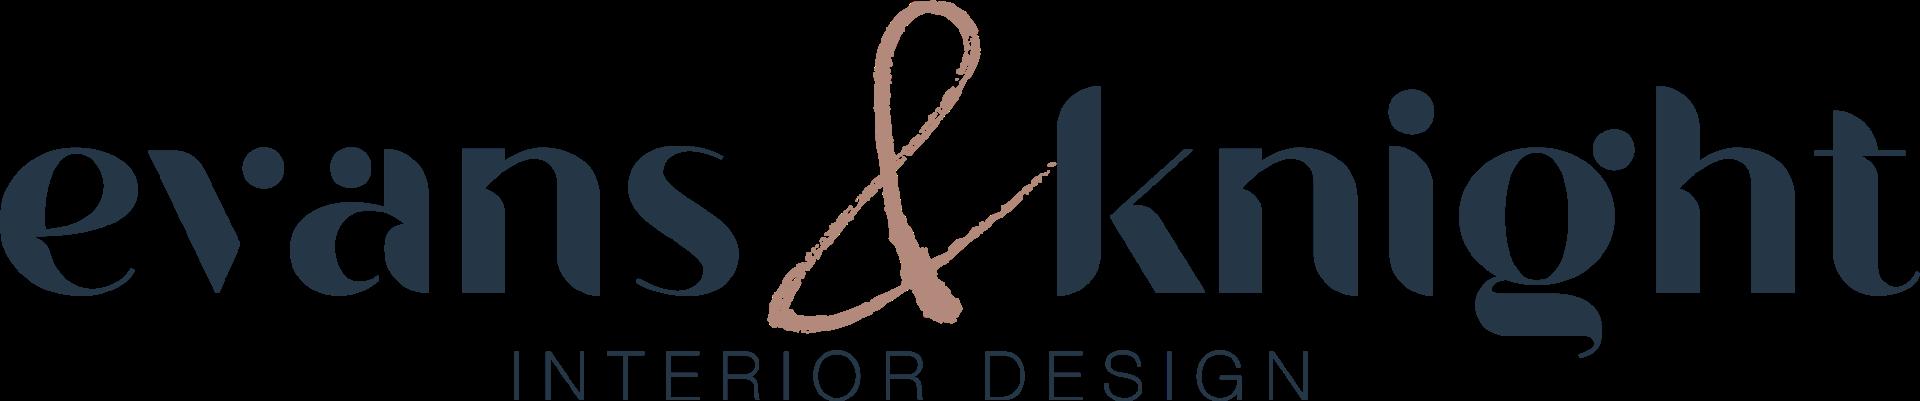 Evans & Knight Interior Design